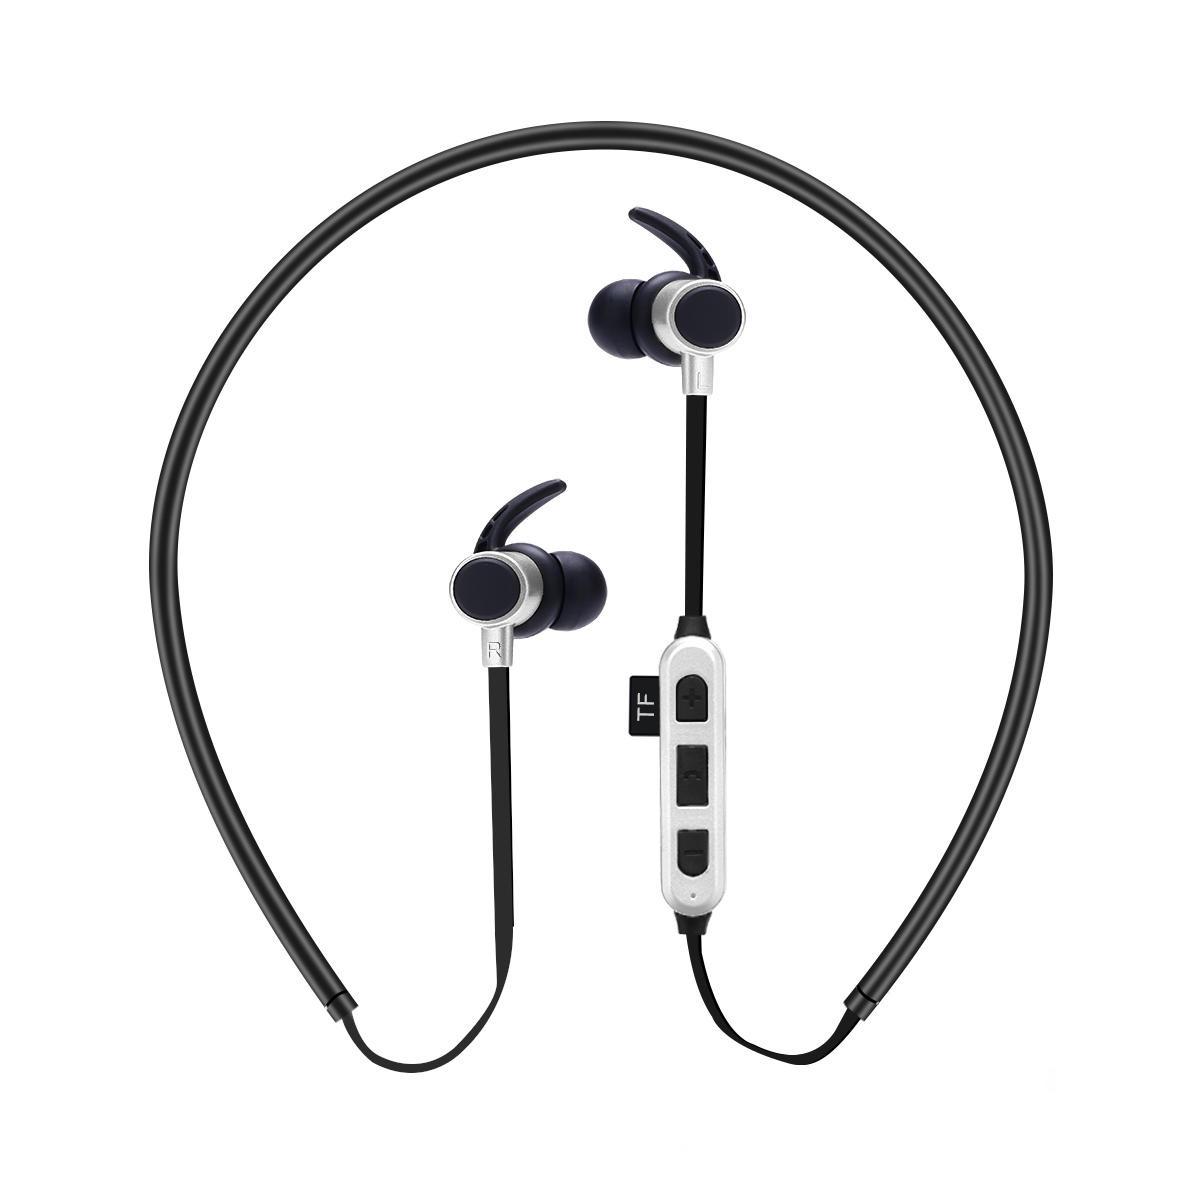 DODGE 入耳式蓝牙耳机 金属磁吸手机游戏语音安卓苹果手机电脑通用 跑步运动无线插卡耳麦 网店一件代发